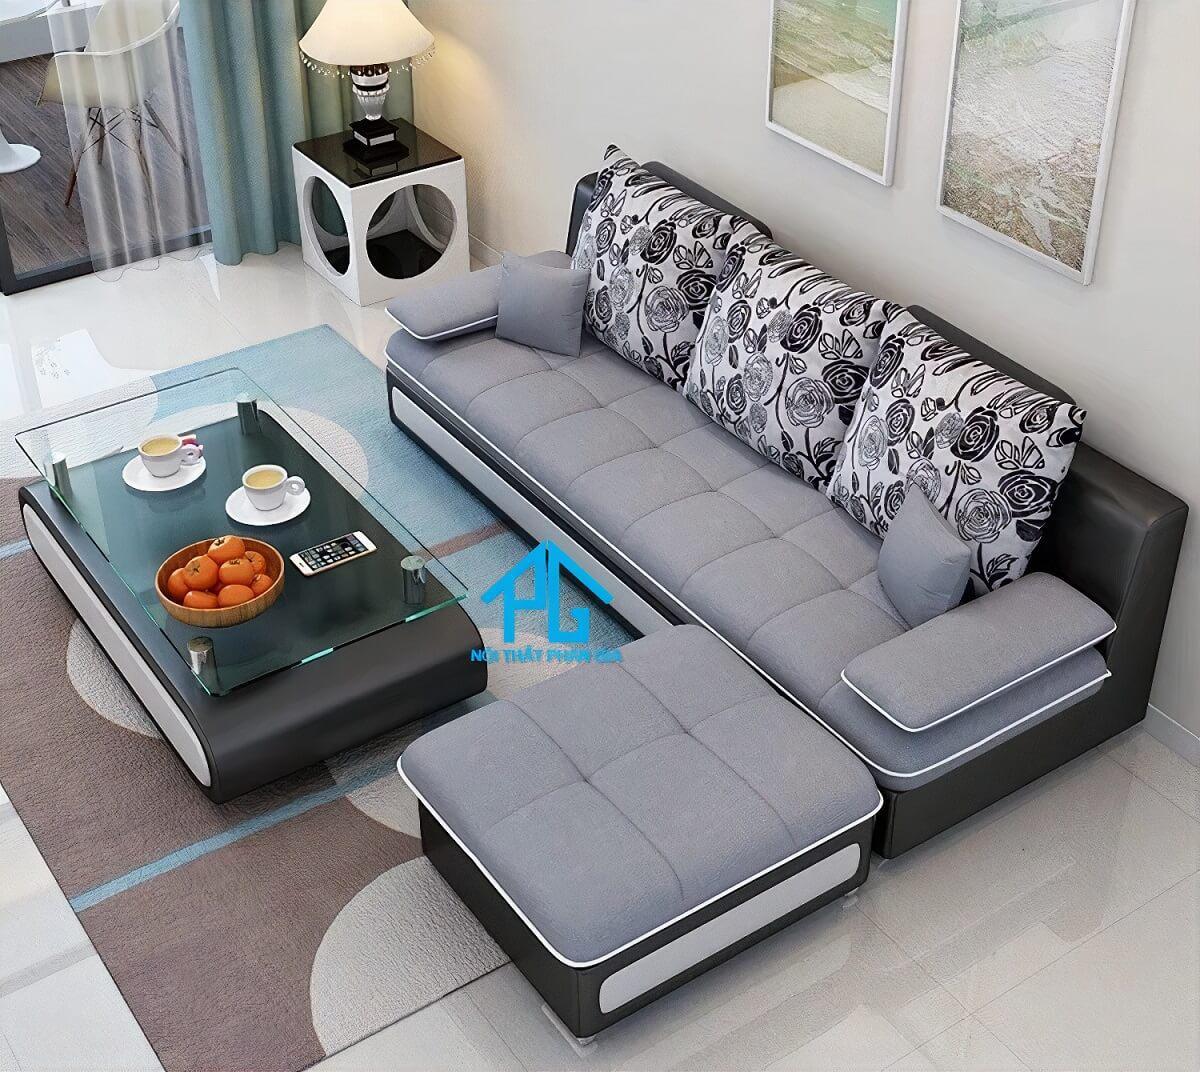 giảm giá sofa băng vải nỉ tphcm